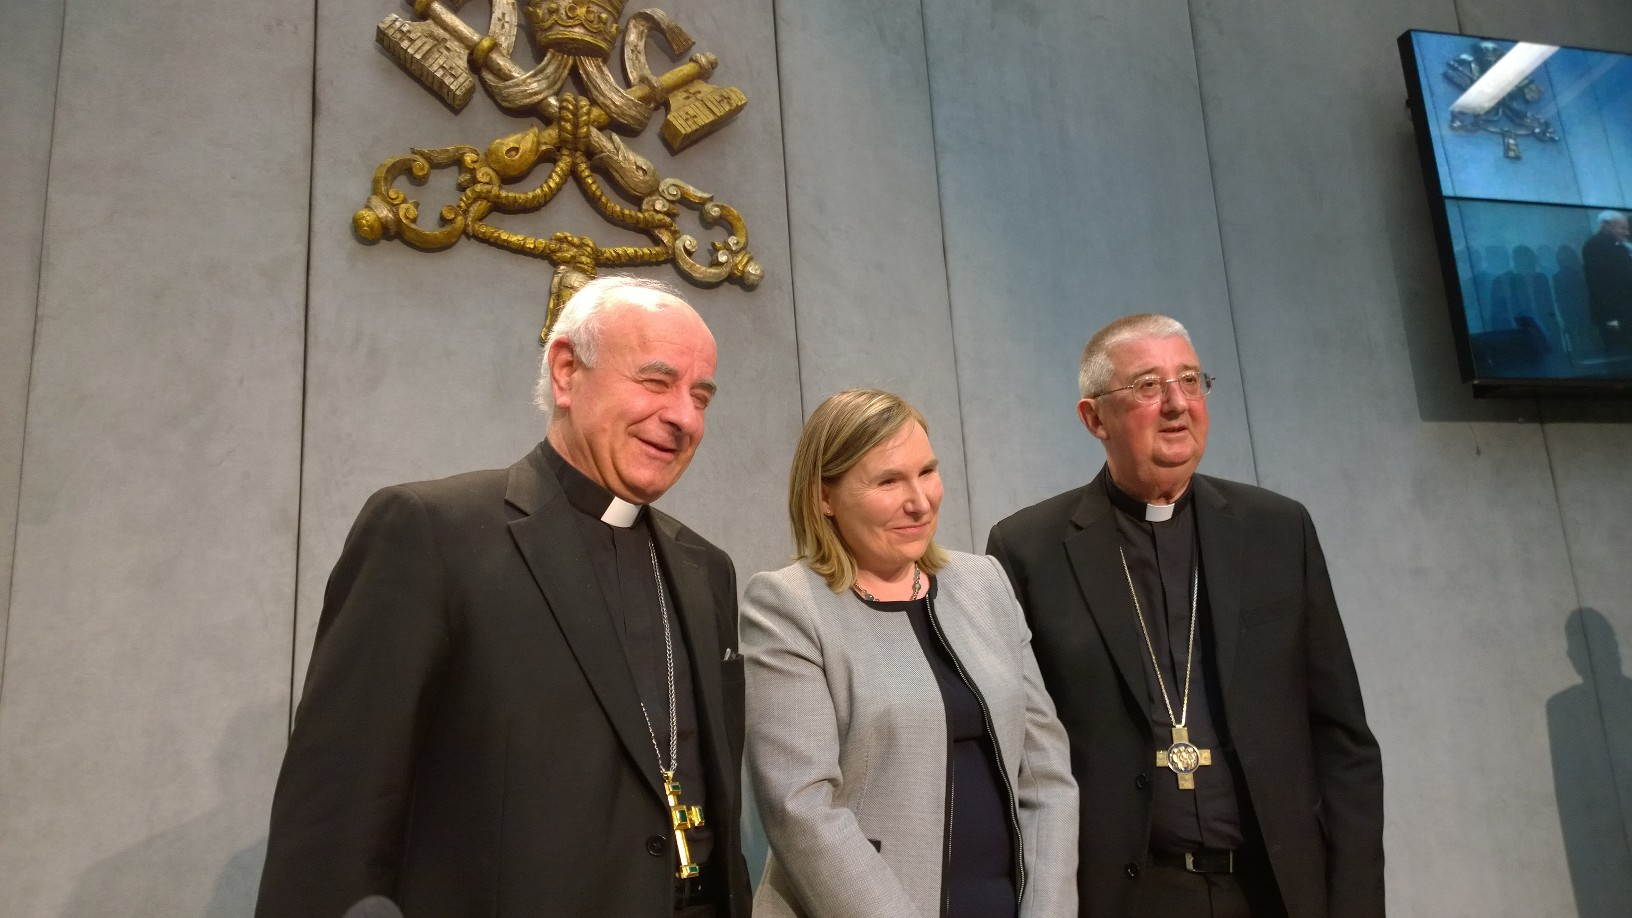 Mgr Paglia, Mme Madigan, ambassadrice d'Irlande et Mgr Martin, Zenit - HSM